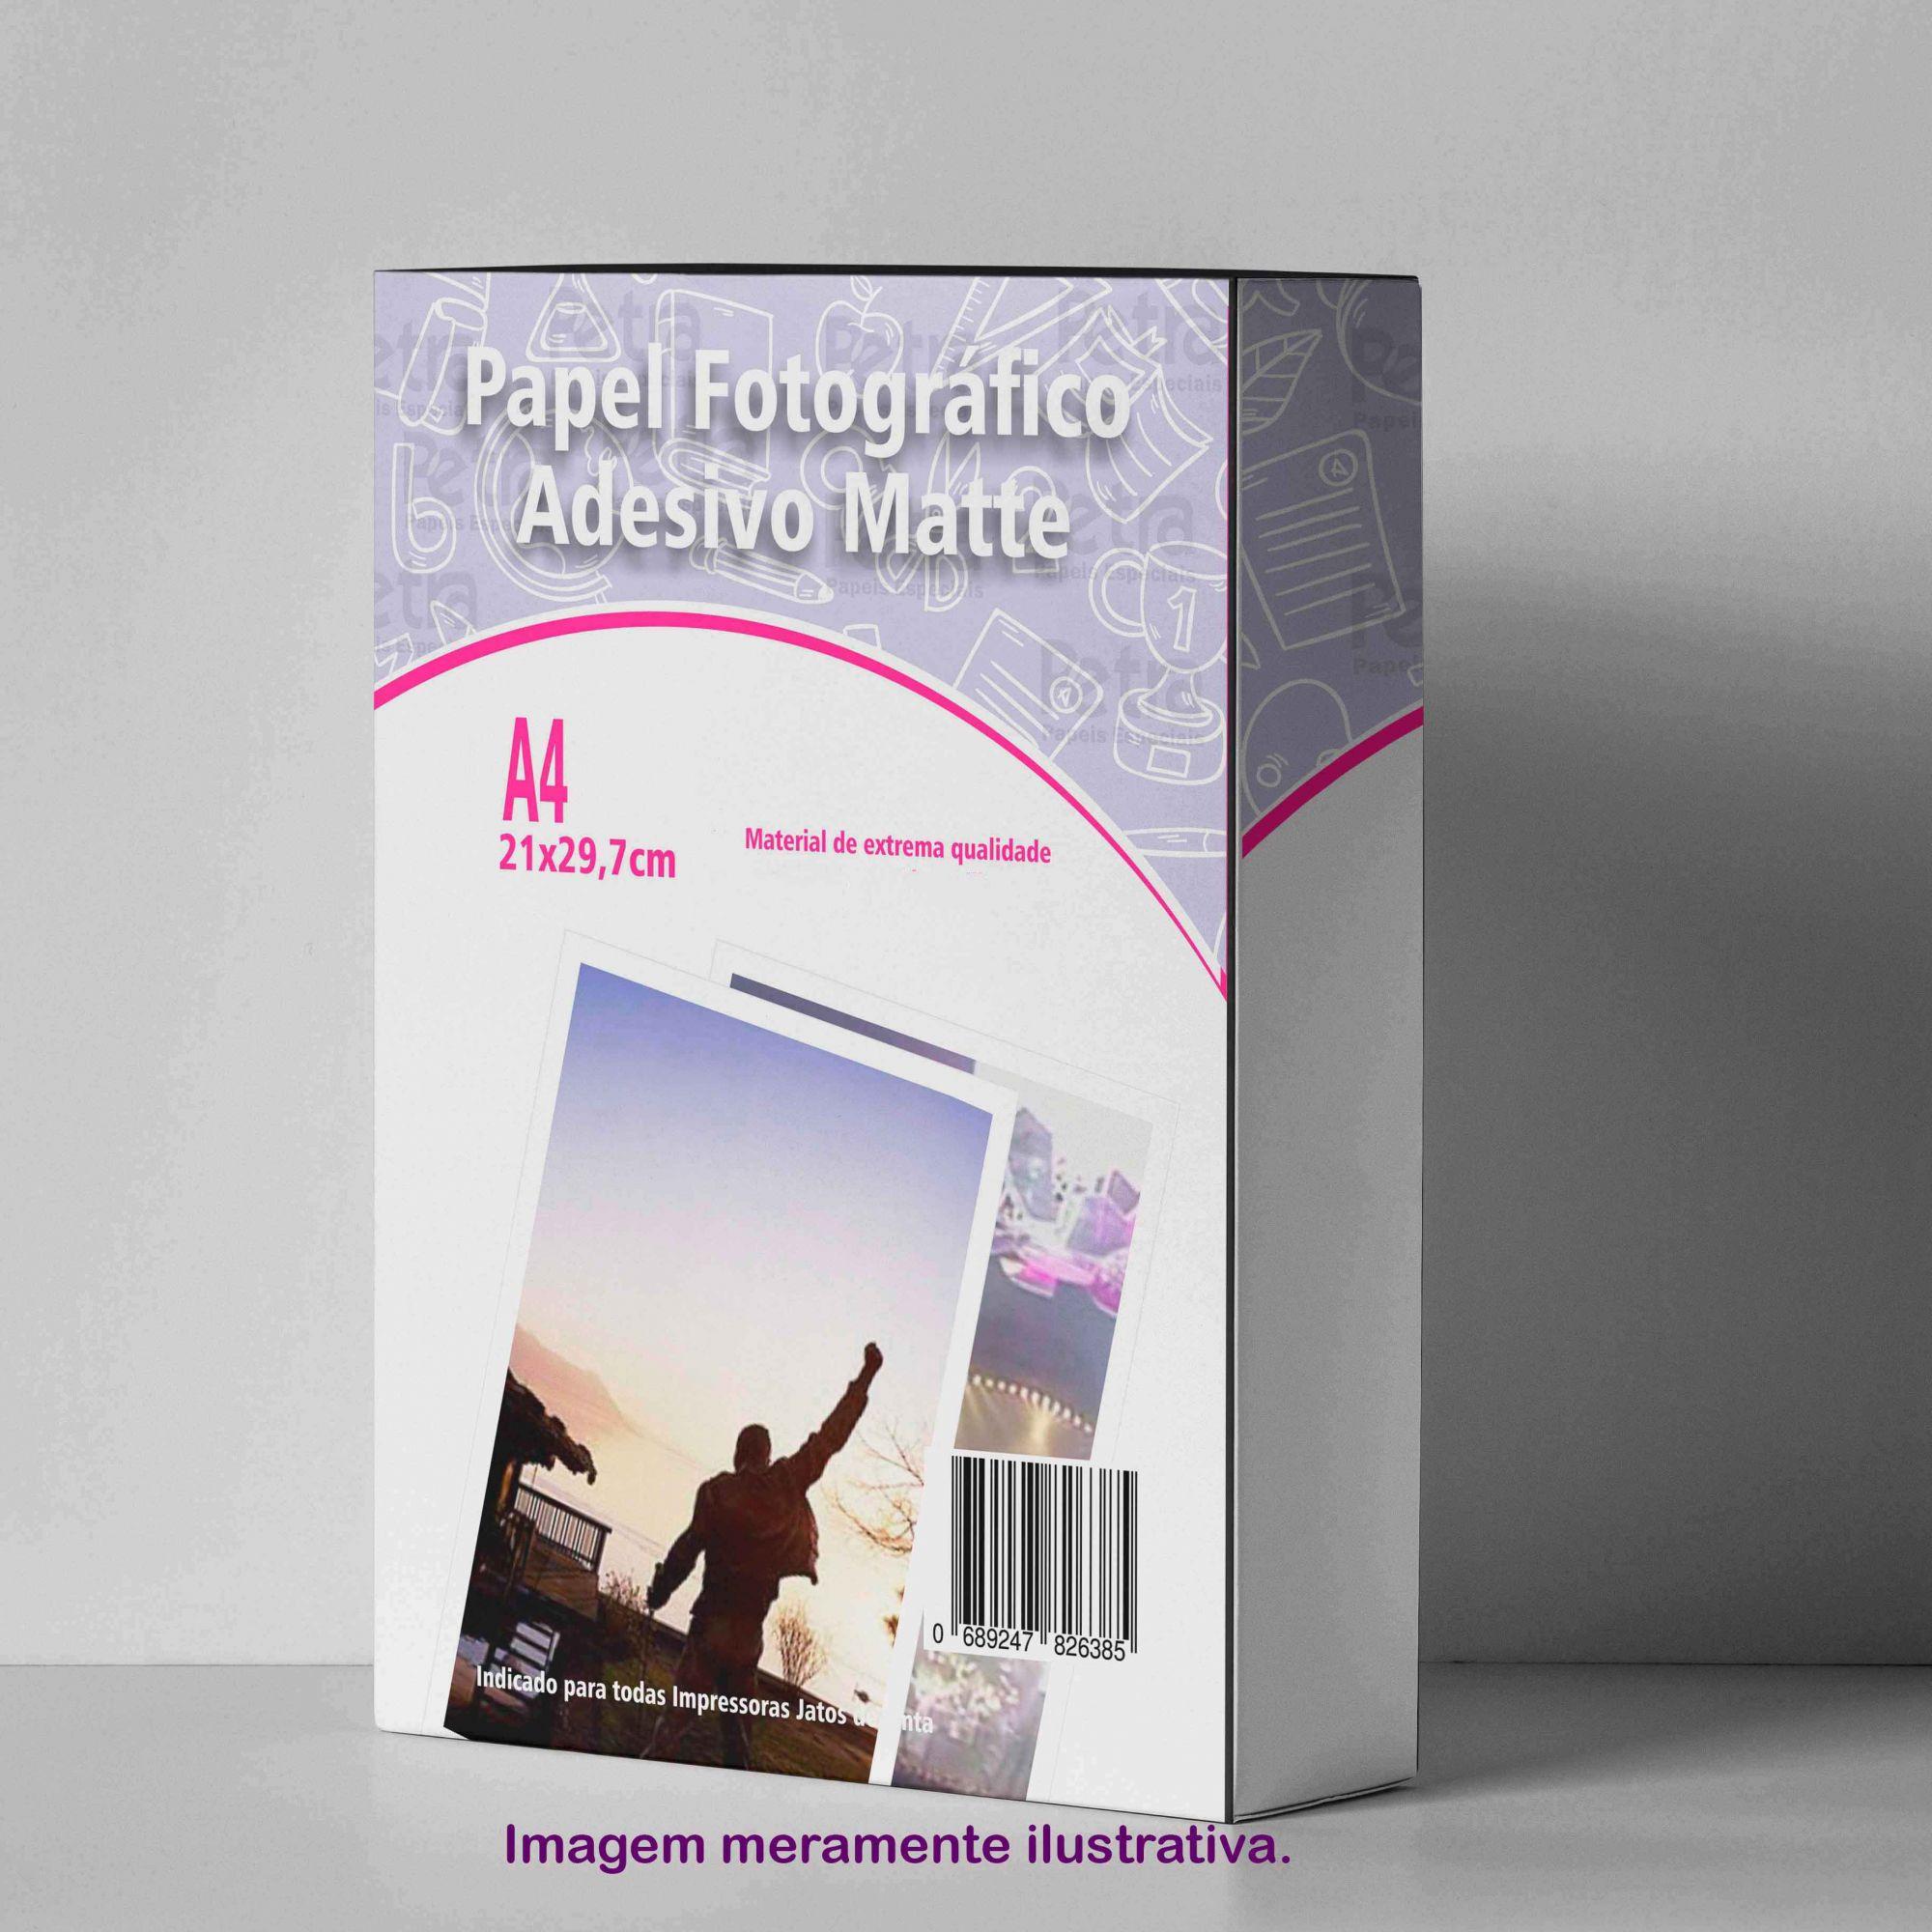 Papel Fotográfico Adesivo (Fosco) Matte 128g/m² A4 - 20 folhas